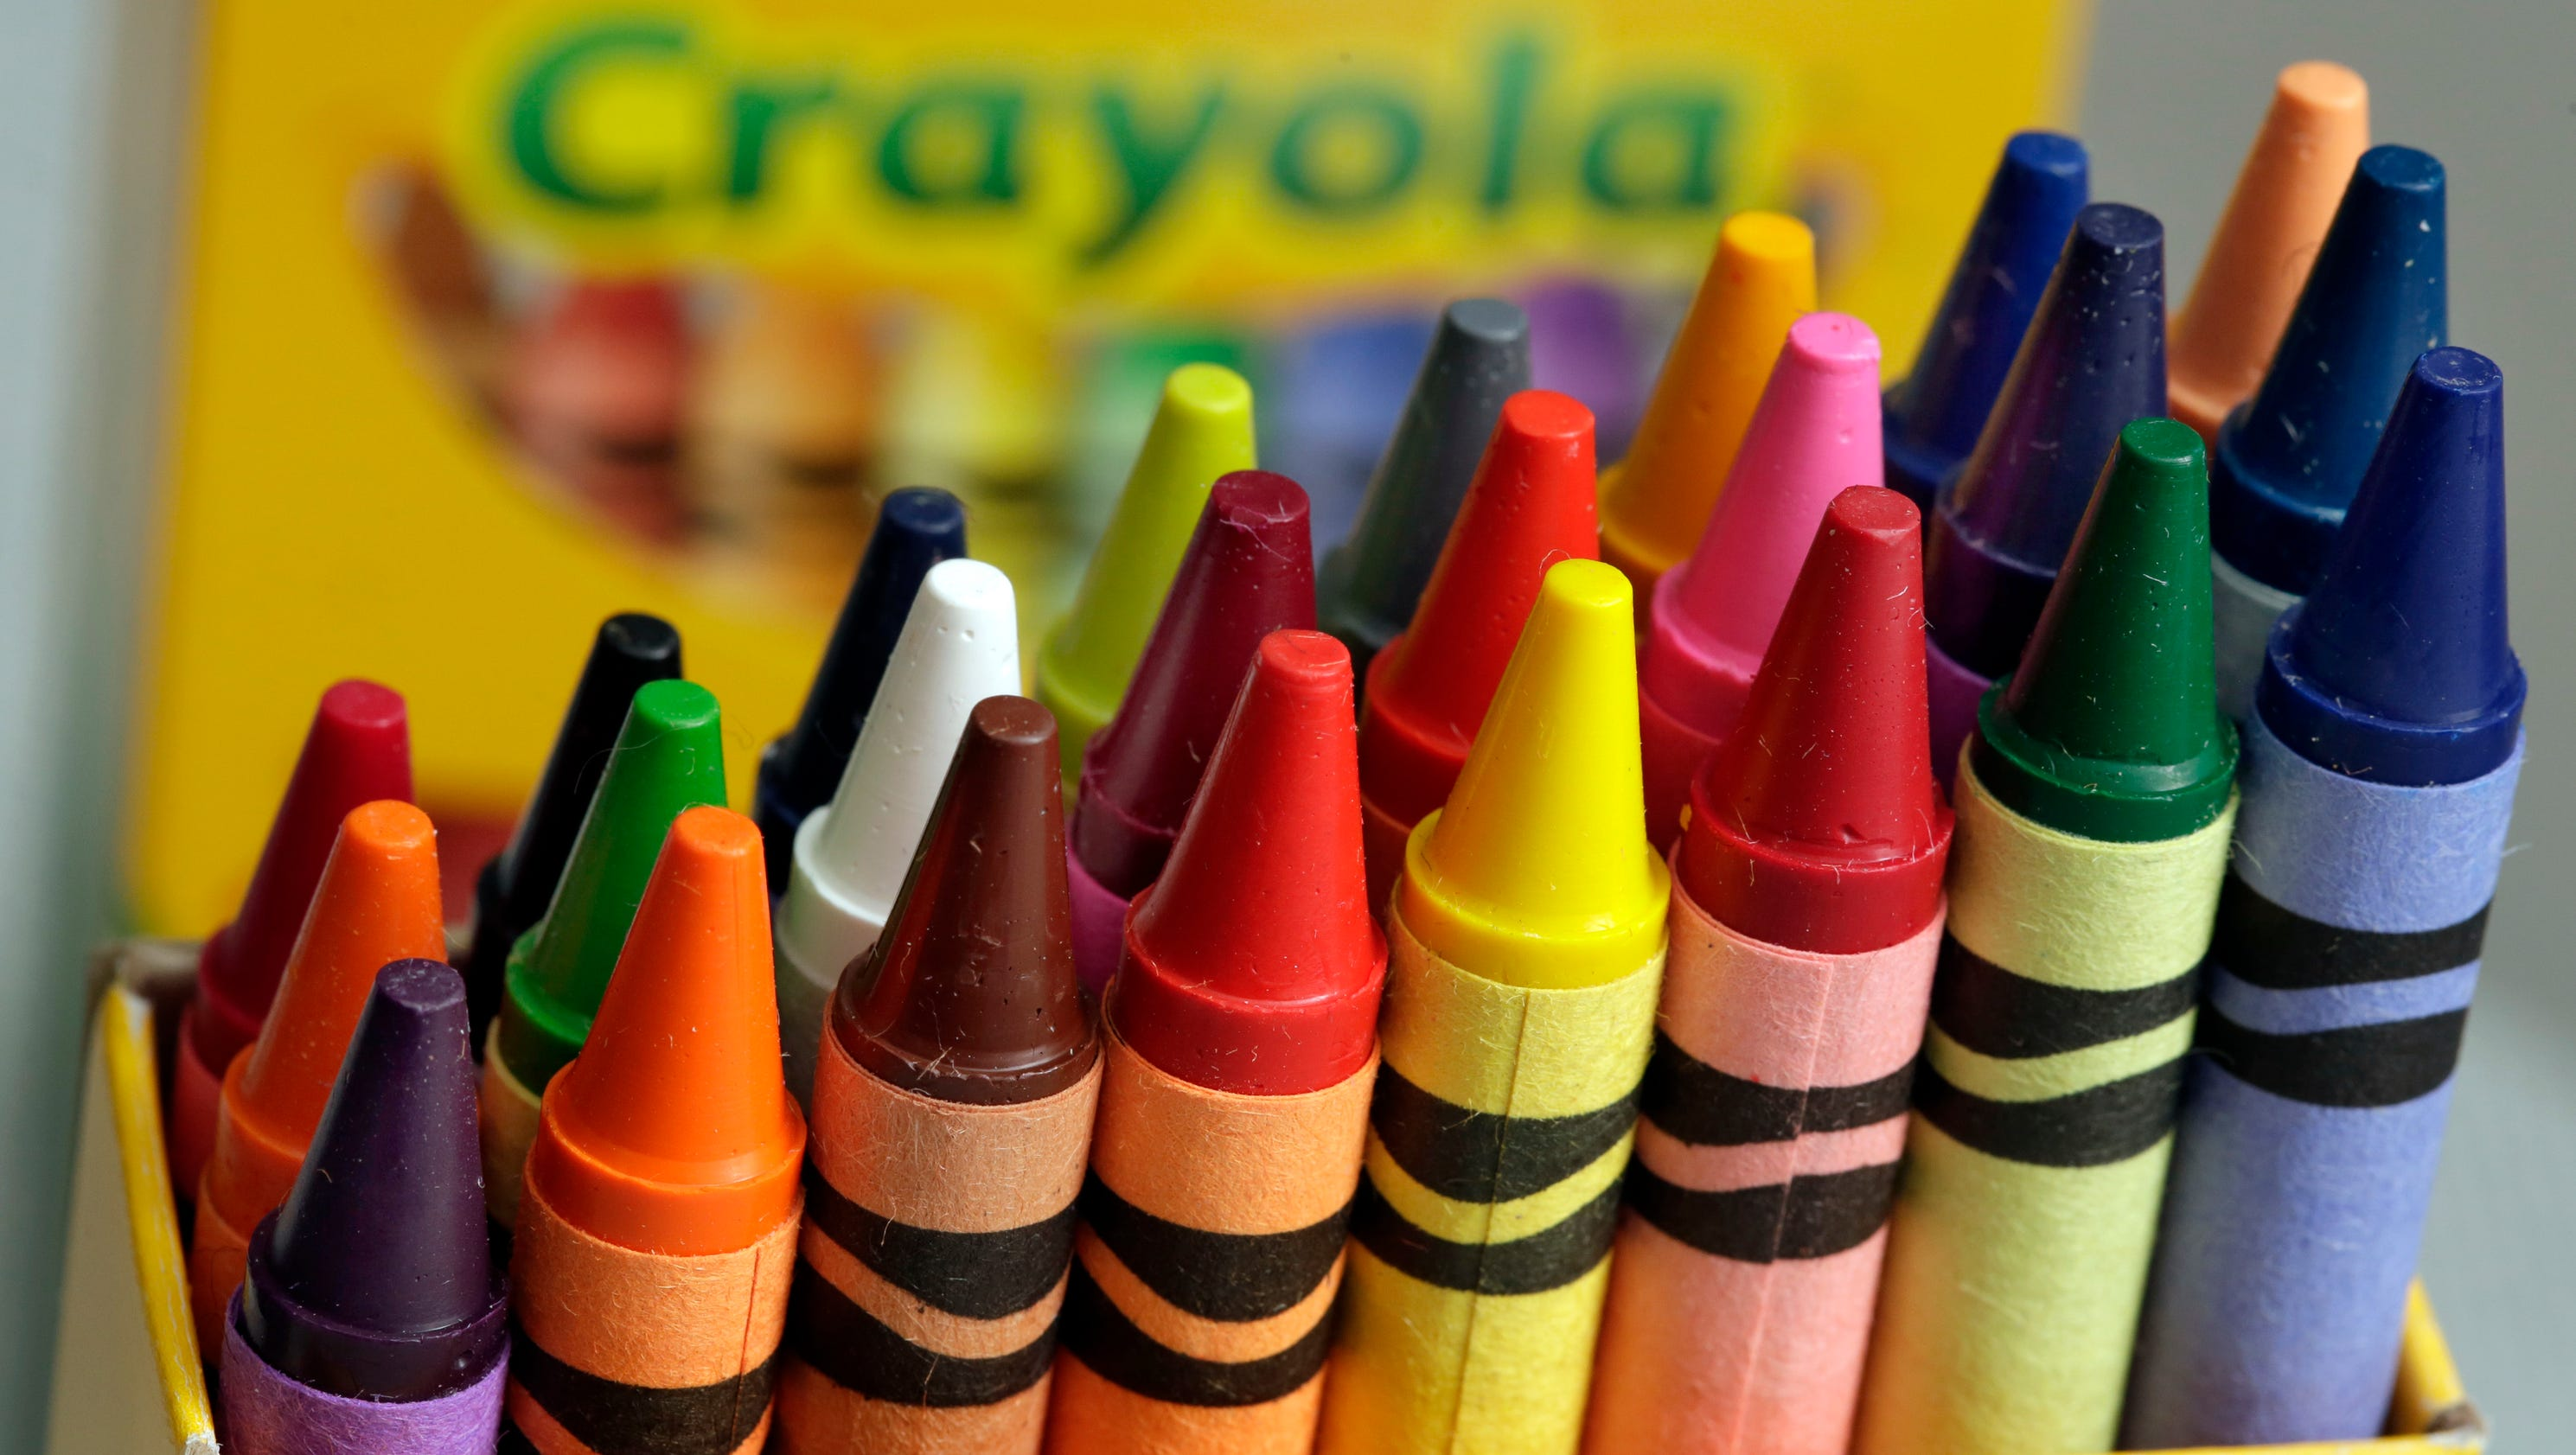 National Crayon Day Crayola will